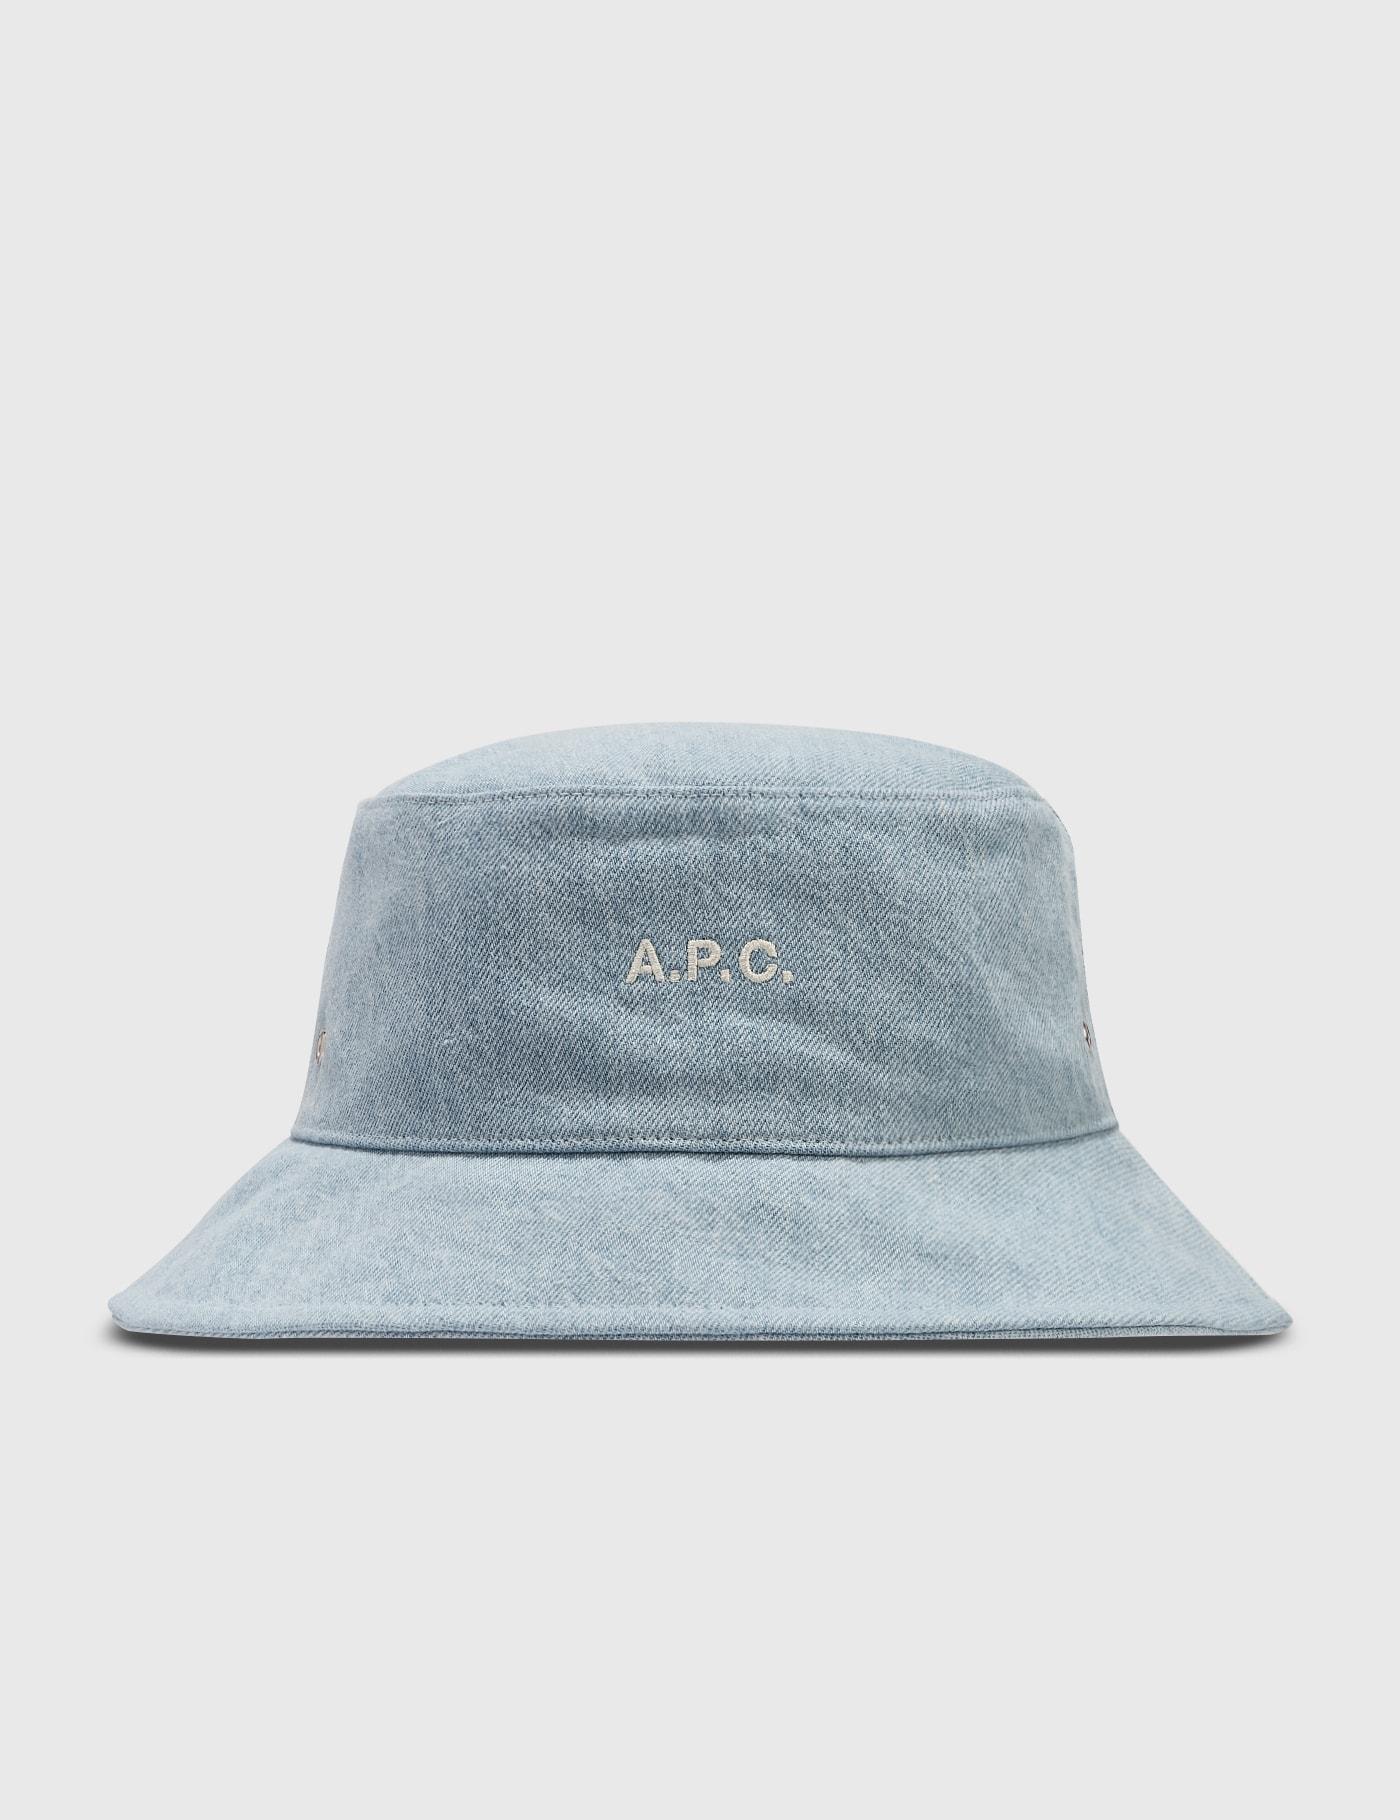 A.p.c. Hats ALEX BUCKET HAT